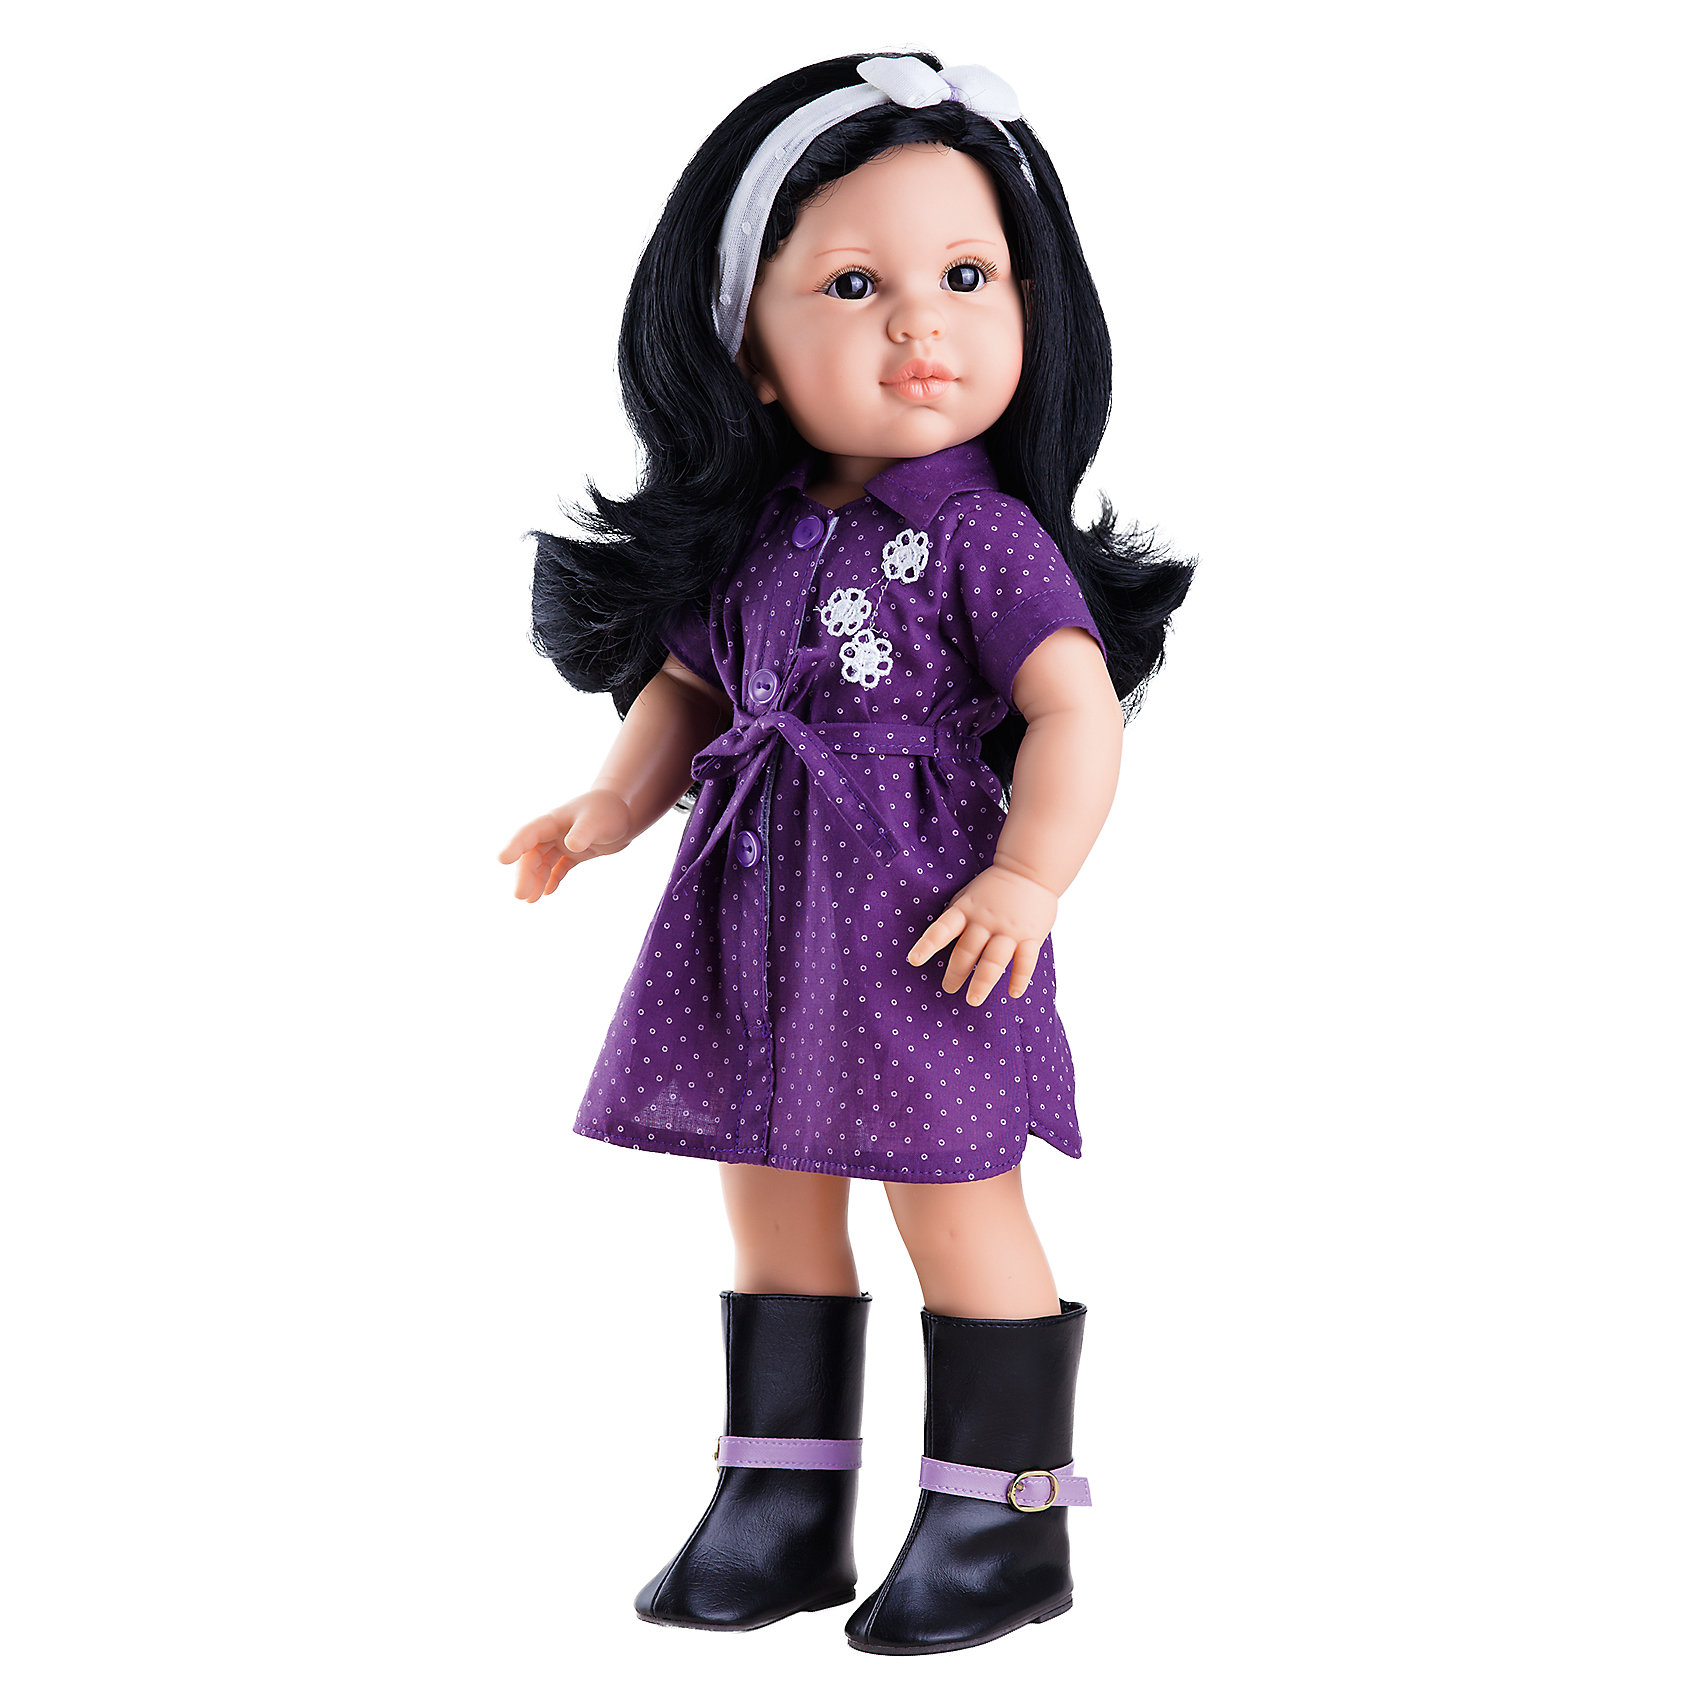 Кукла Лина, 42 см, Paola ReinaКлассические куклы<br><br><br>Ширина мм: 510<br>Глубина мм: 175<br>Высота мм: 105<br>Вес г: 1225<br>Возраст от месяцев: 36<br>Возраст до месяцев: 144<br>Пол: Женский<br>Возраст: Детский<br>SKU: 6671056